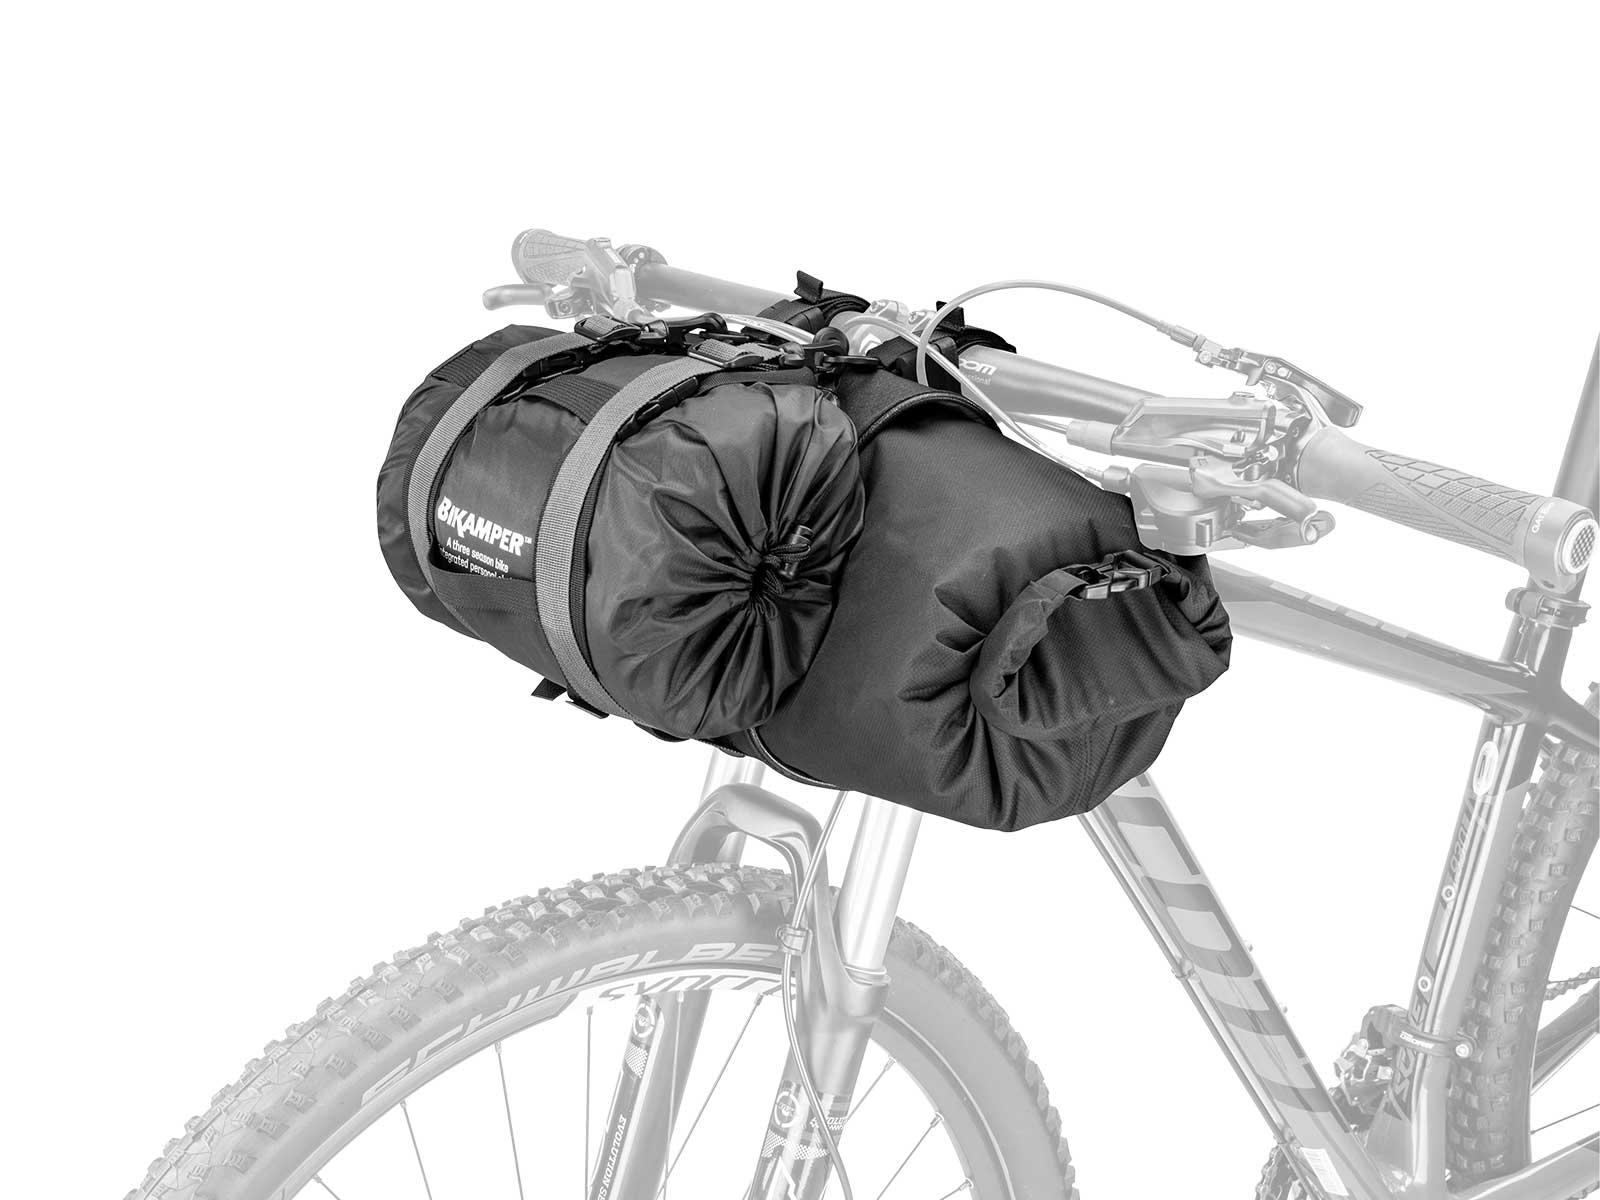 Topeak TBPFL1B Frontloader Handlebar Mount Bike Packing Camping Gear Bag Tour